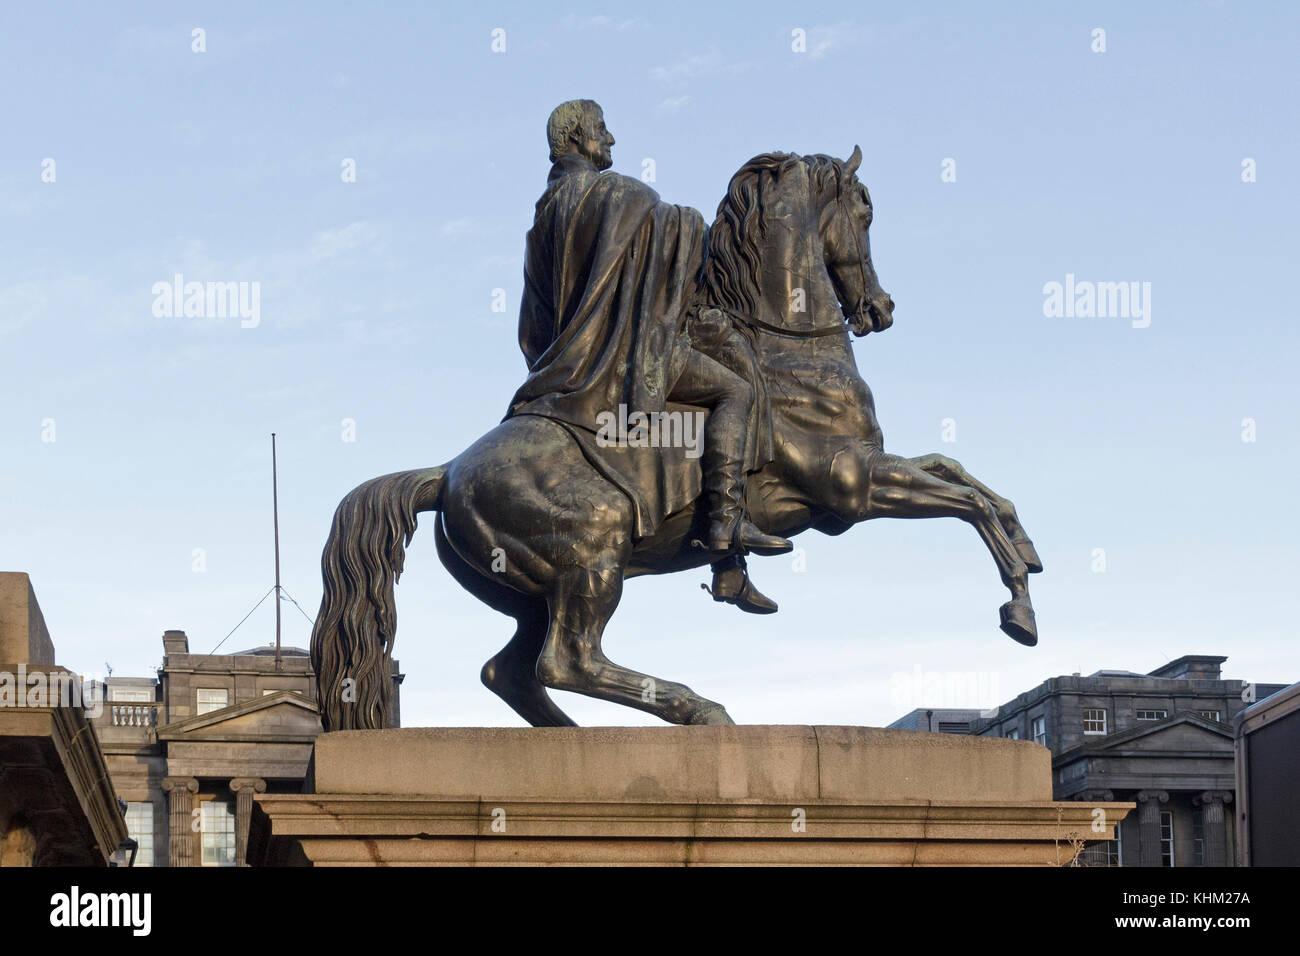 statue of the Duke of Wellington, Edinburgh, Scotland, Great Britain - Stock Image